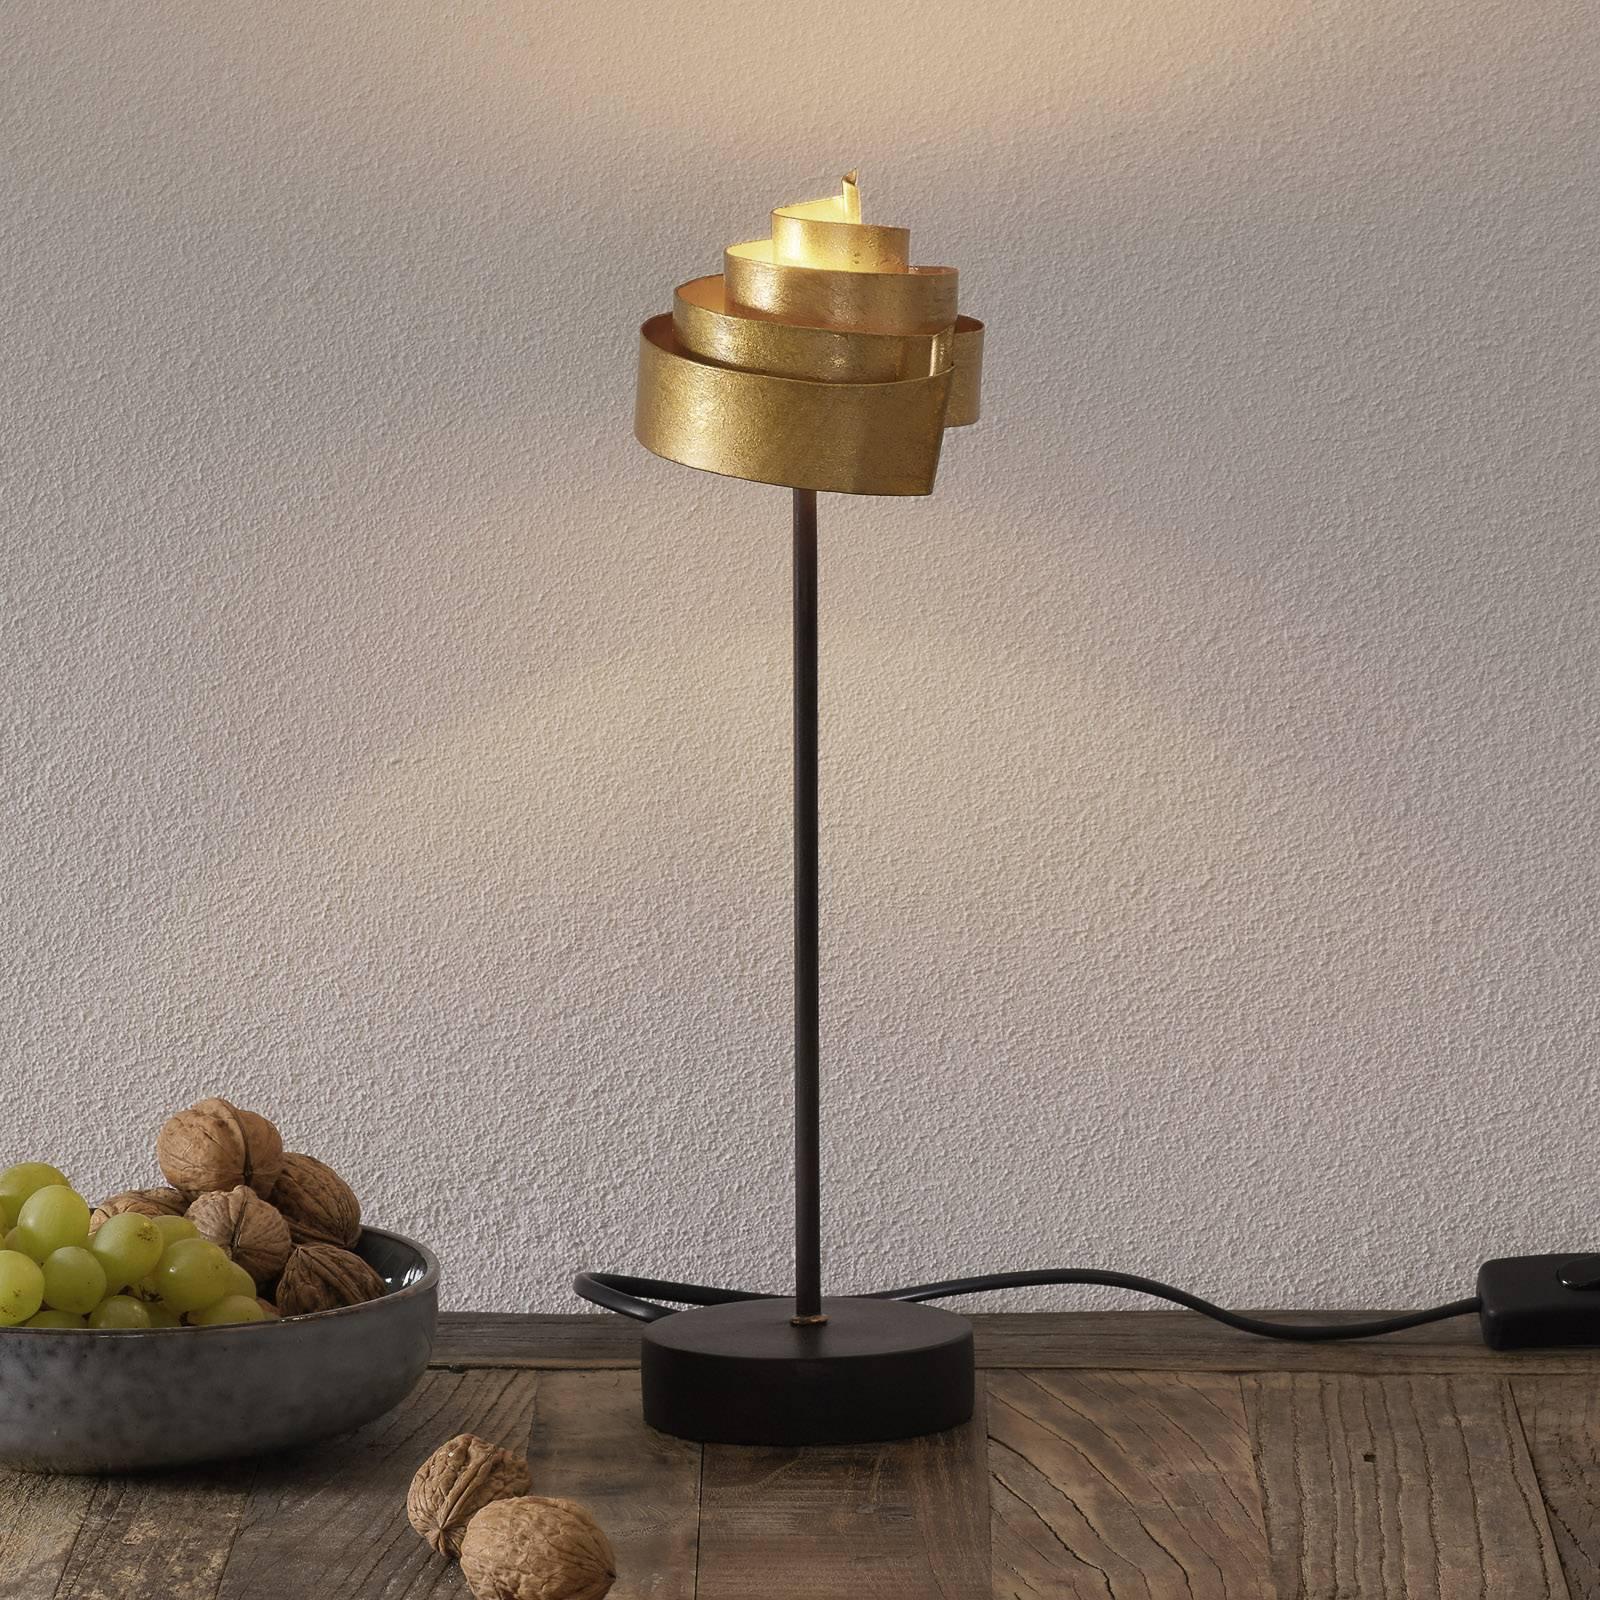 Formfullendt bordlampe BANDEROLE GOLD av jern